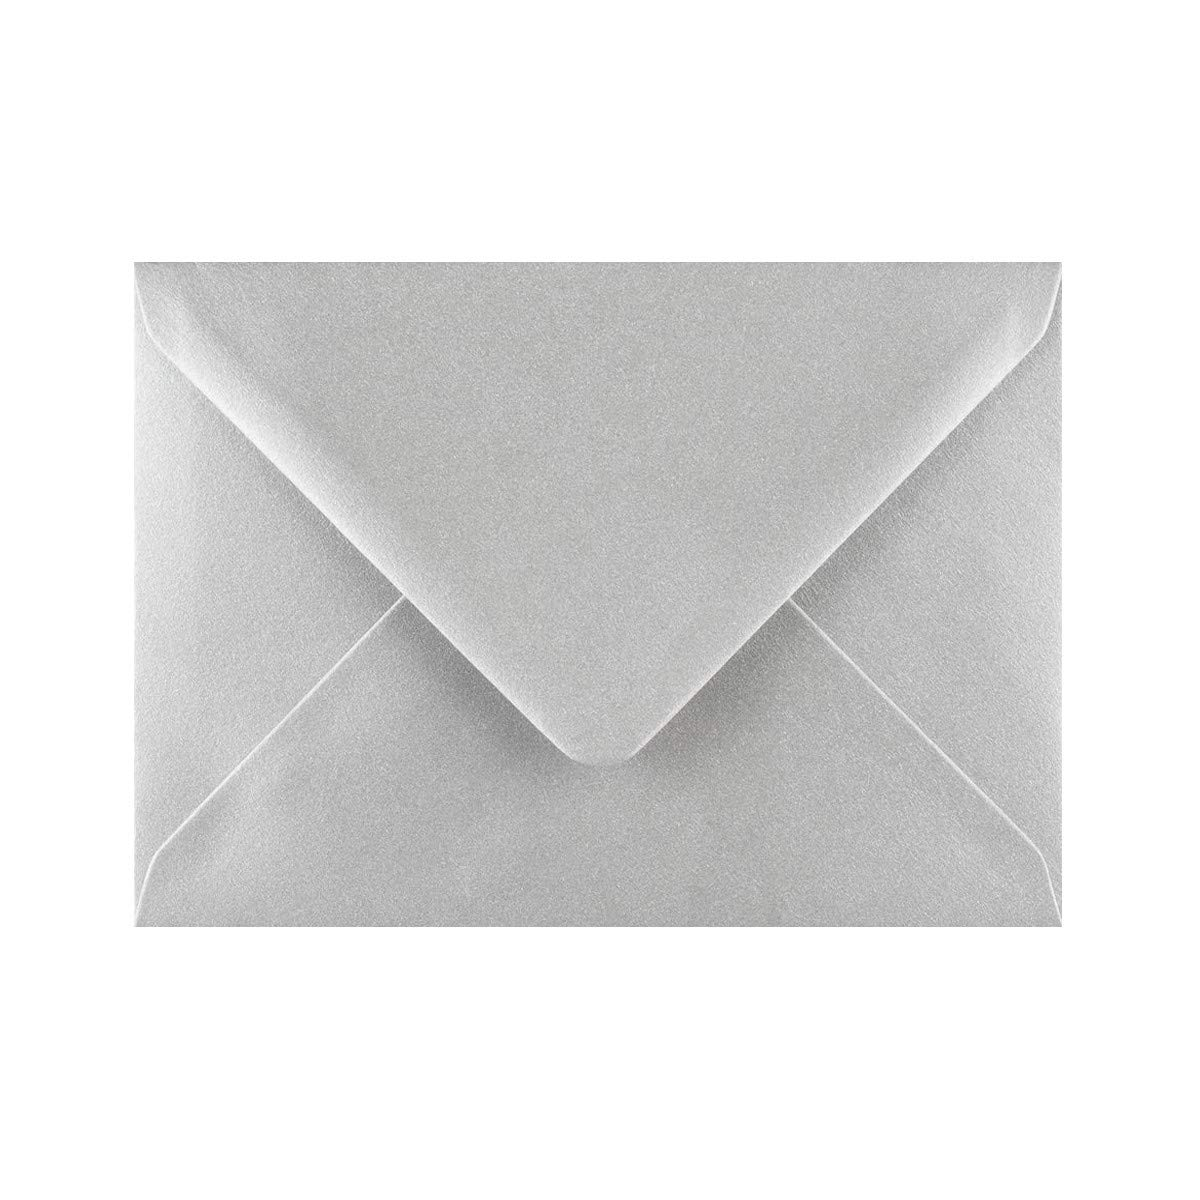 Multi Coloured C6 Gummed Metallic Envelopes. 100 Metallic Colour Envelopes